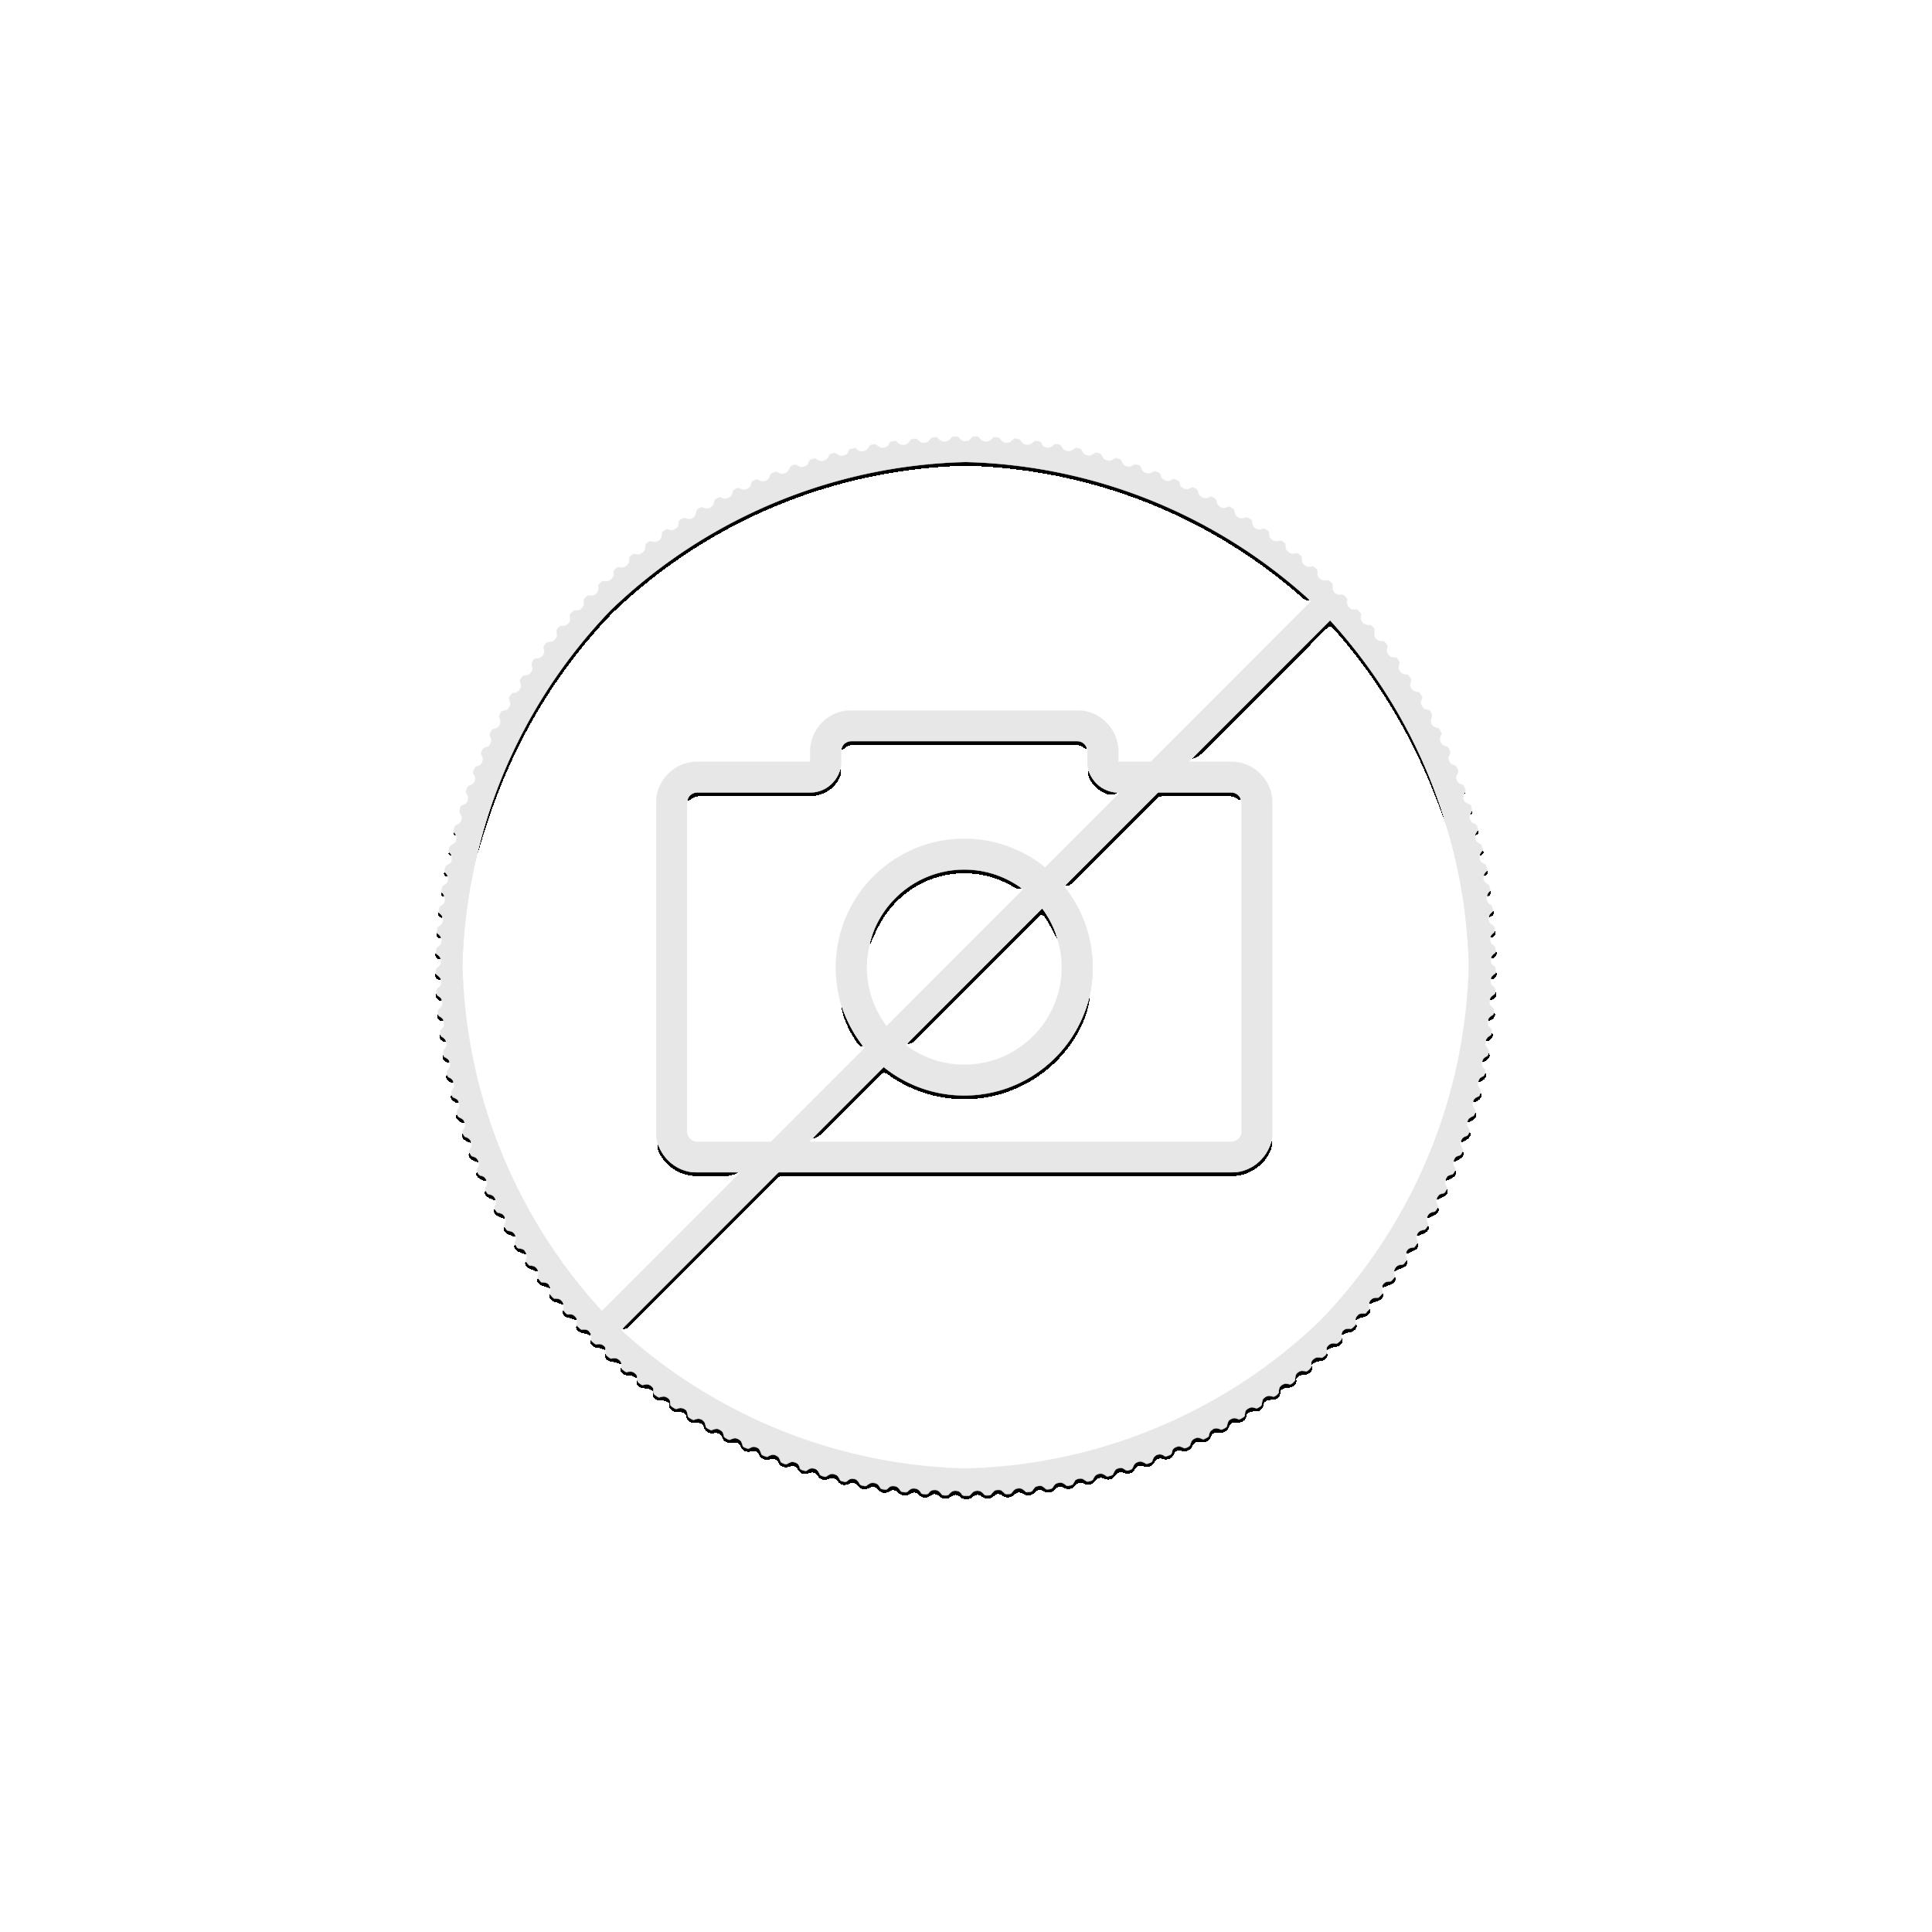 Gold bar 10 grams C. Hafner